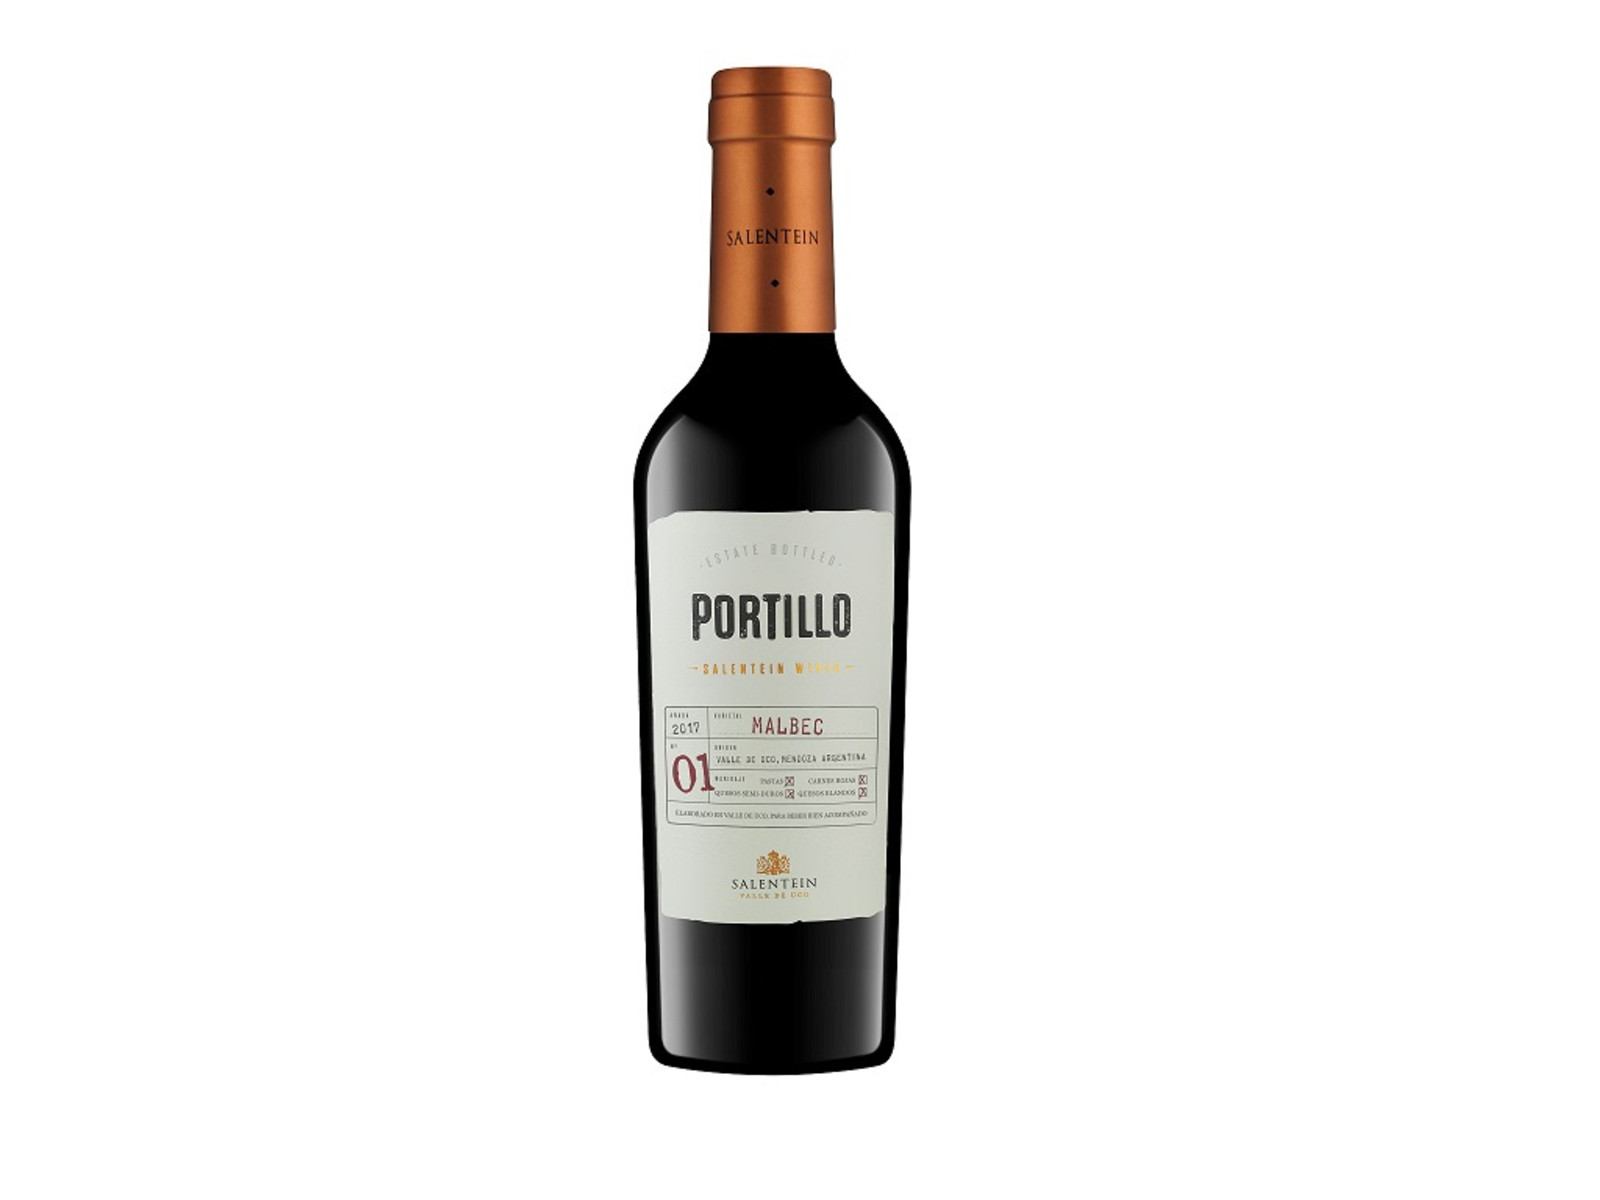 Bodegas Salentein Portillo / Malbec / 0,375L